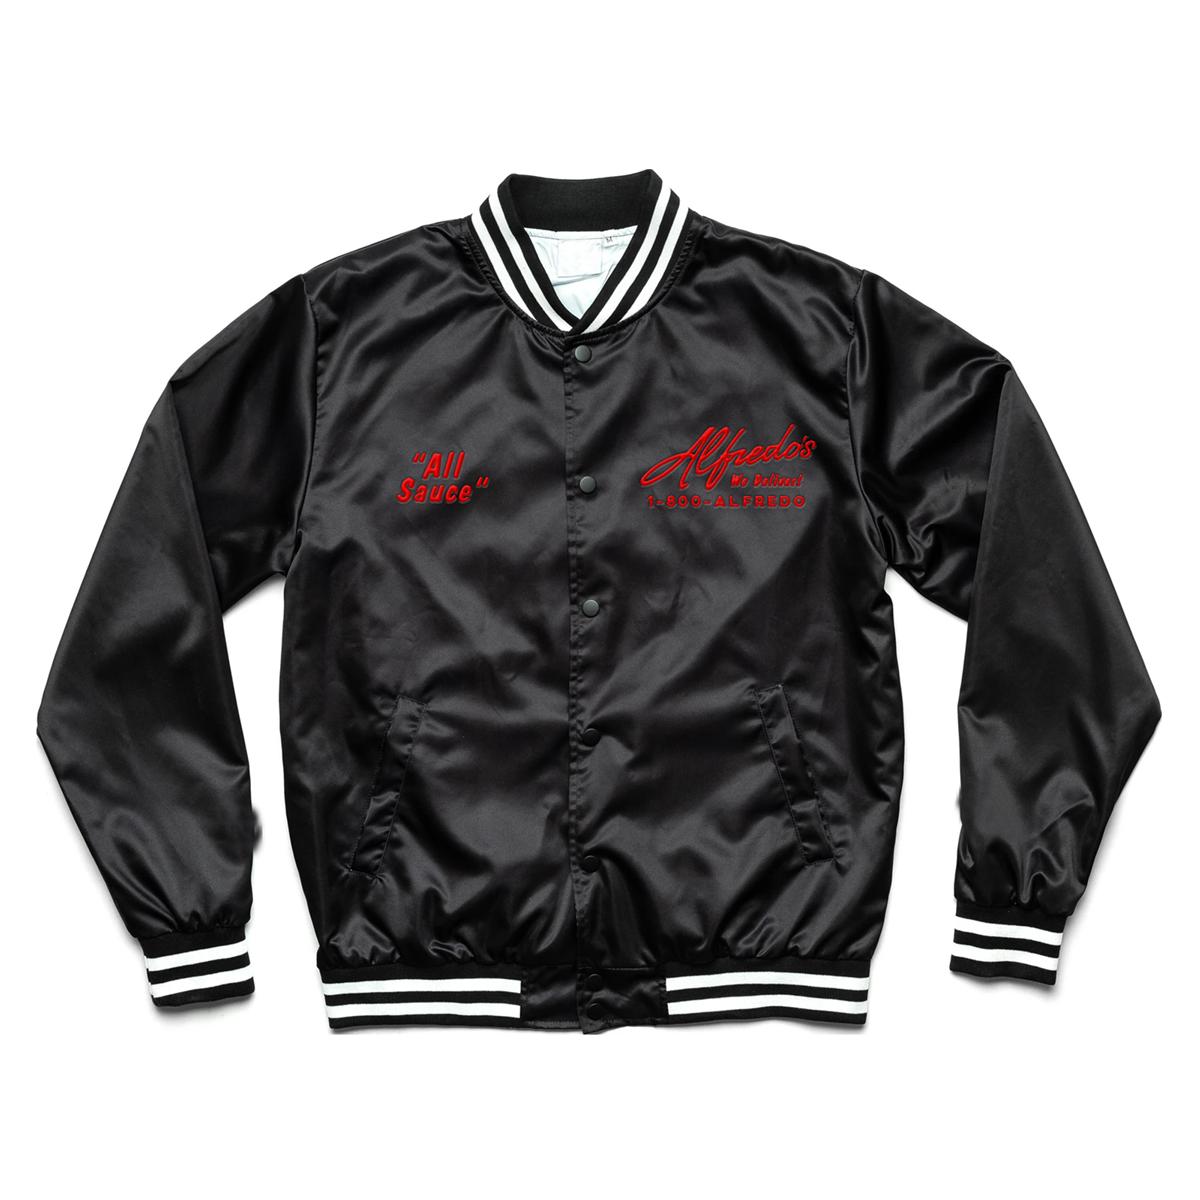 Alfredo's Delivery Jacket - Black